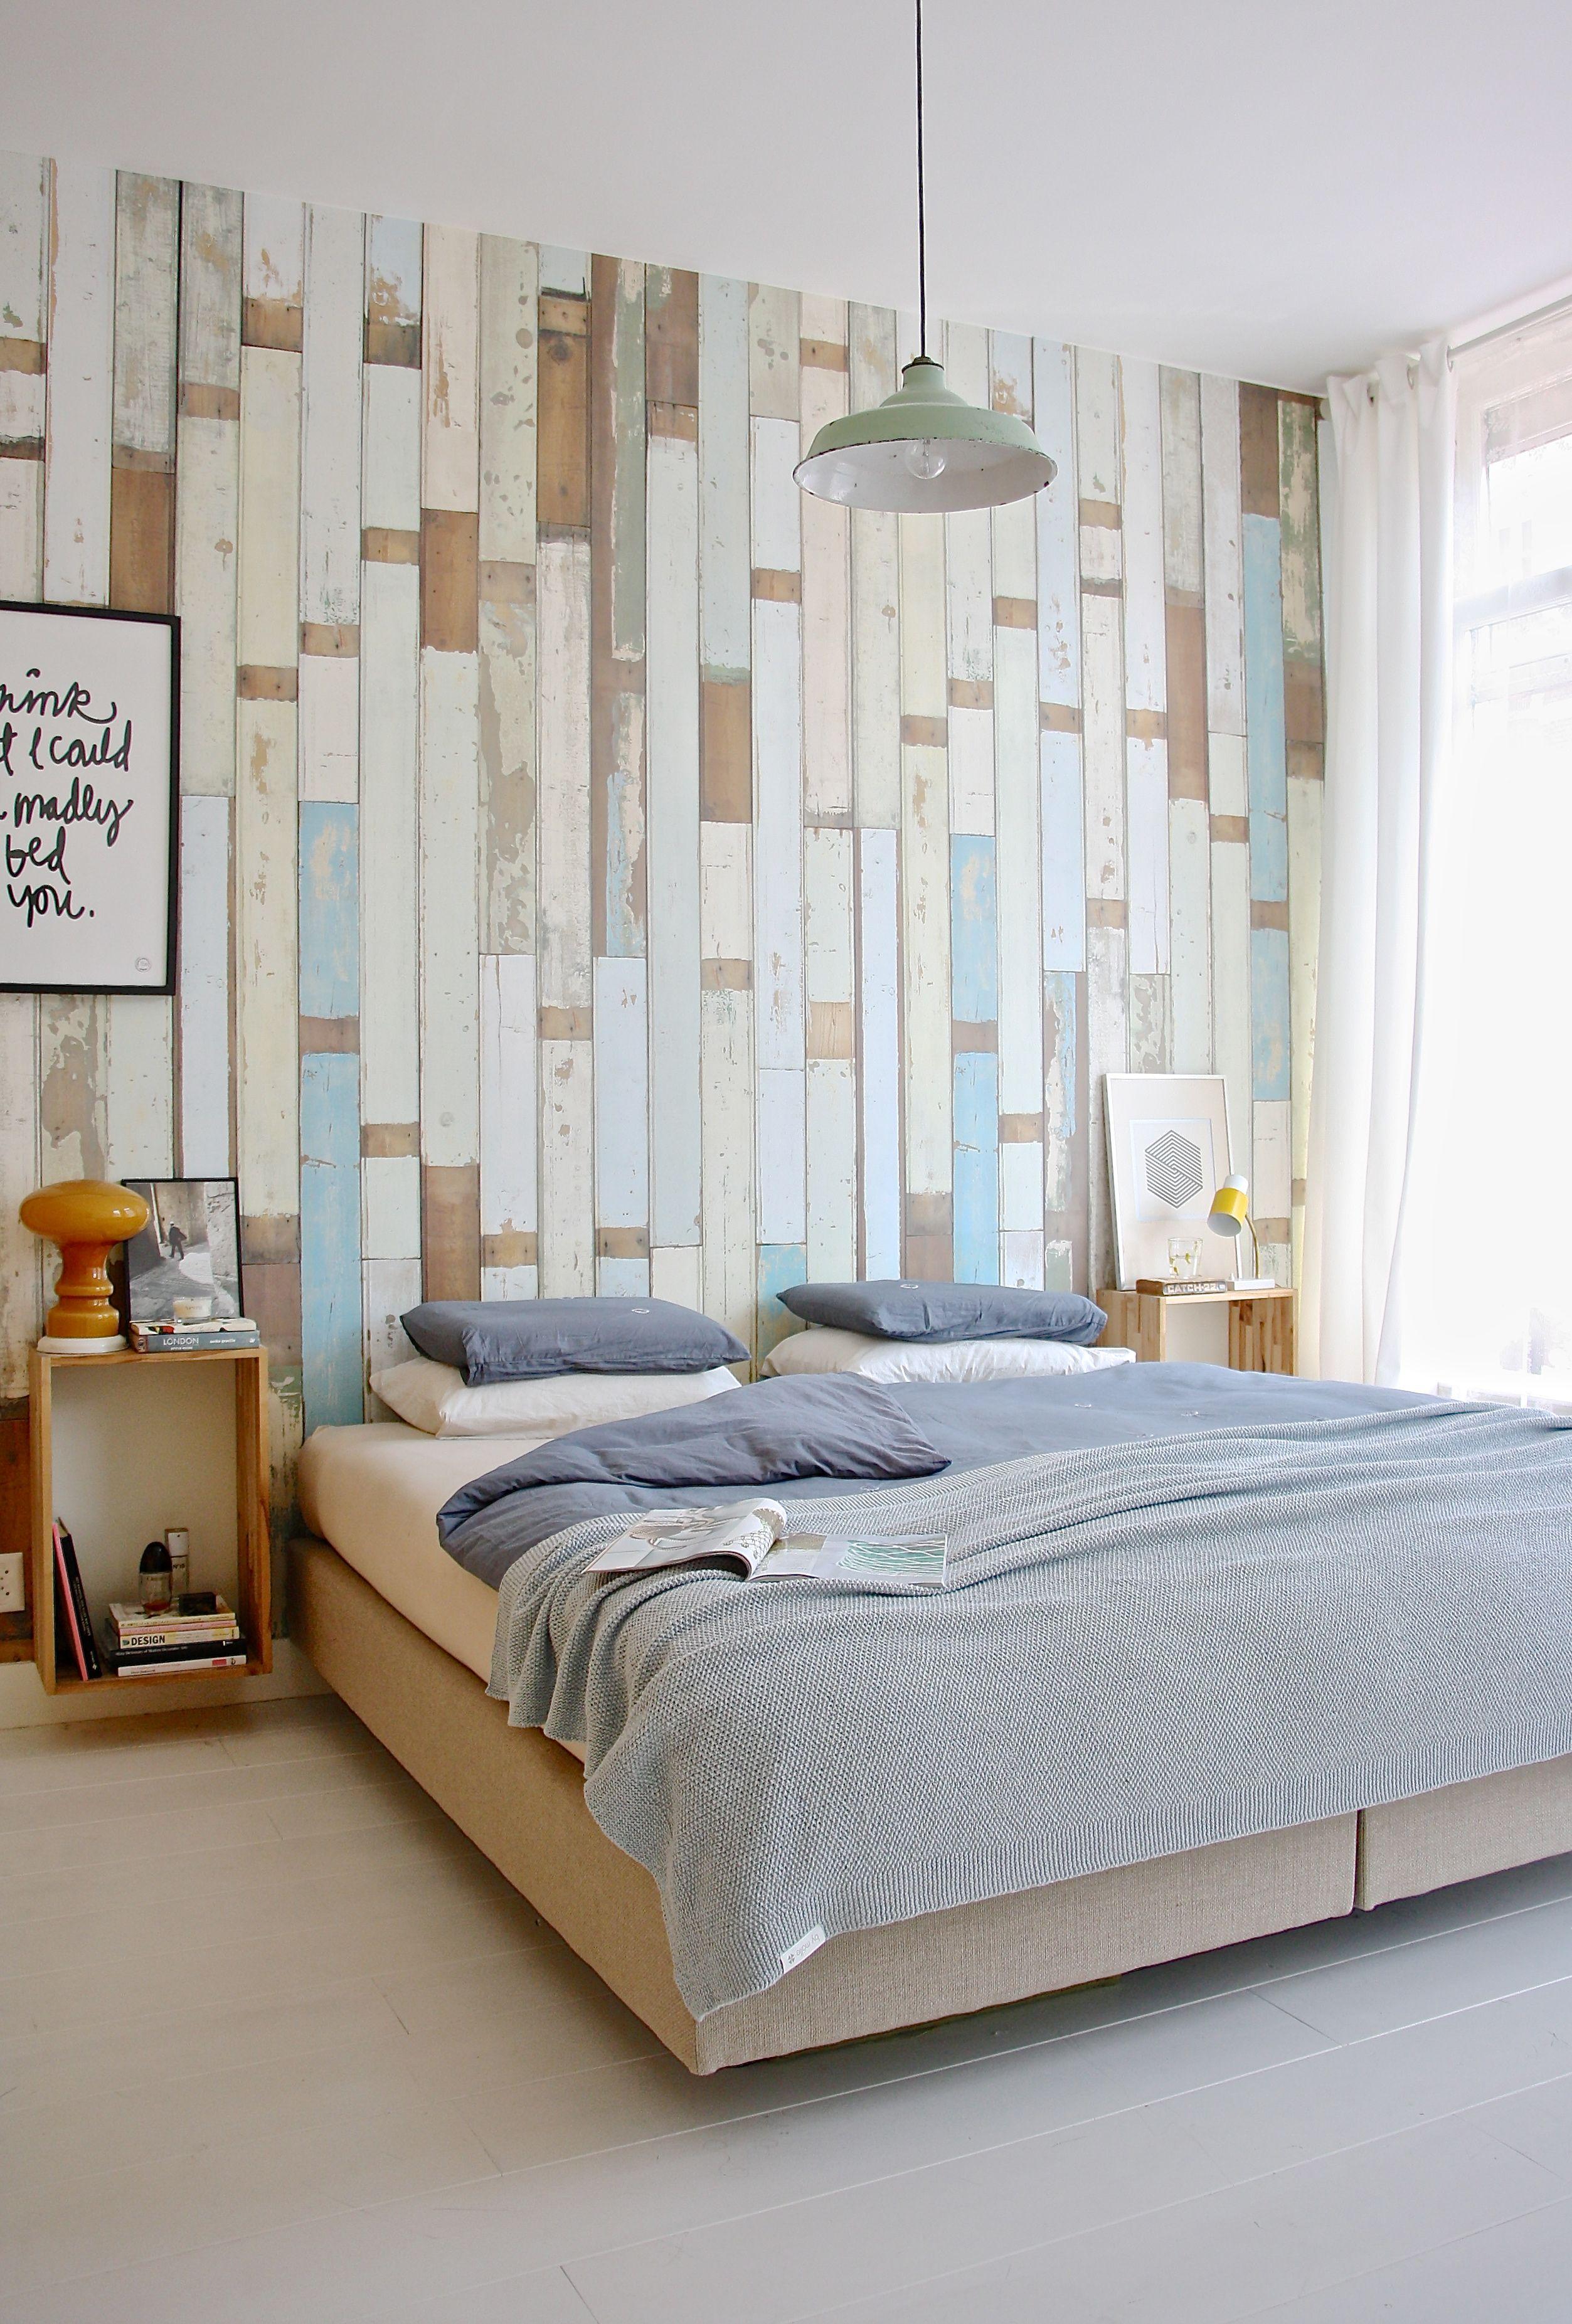 Fascinating Scandinavian Style Bedroom Design Inspirations Amusing